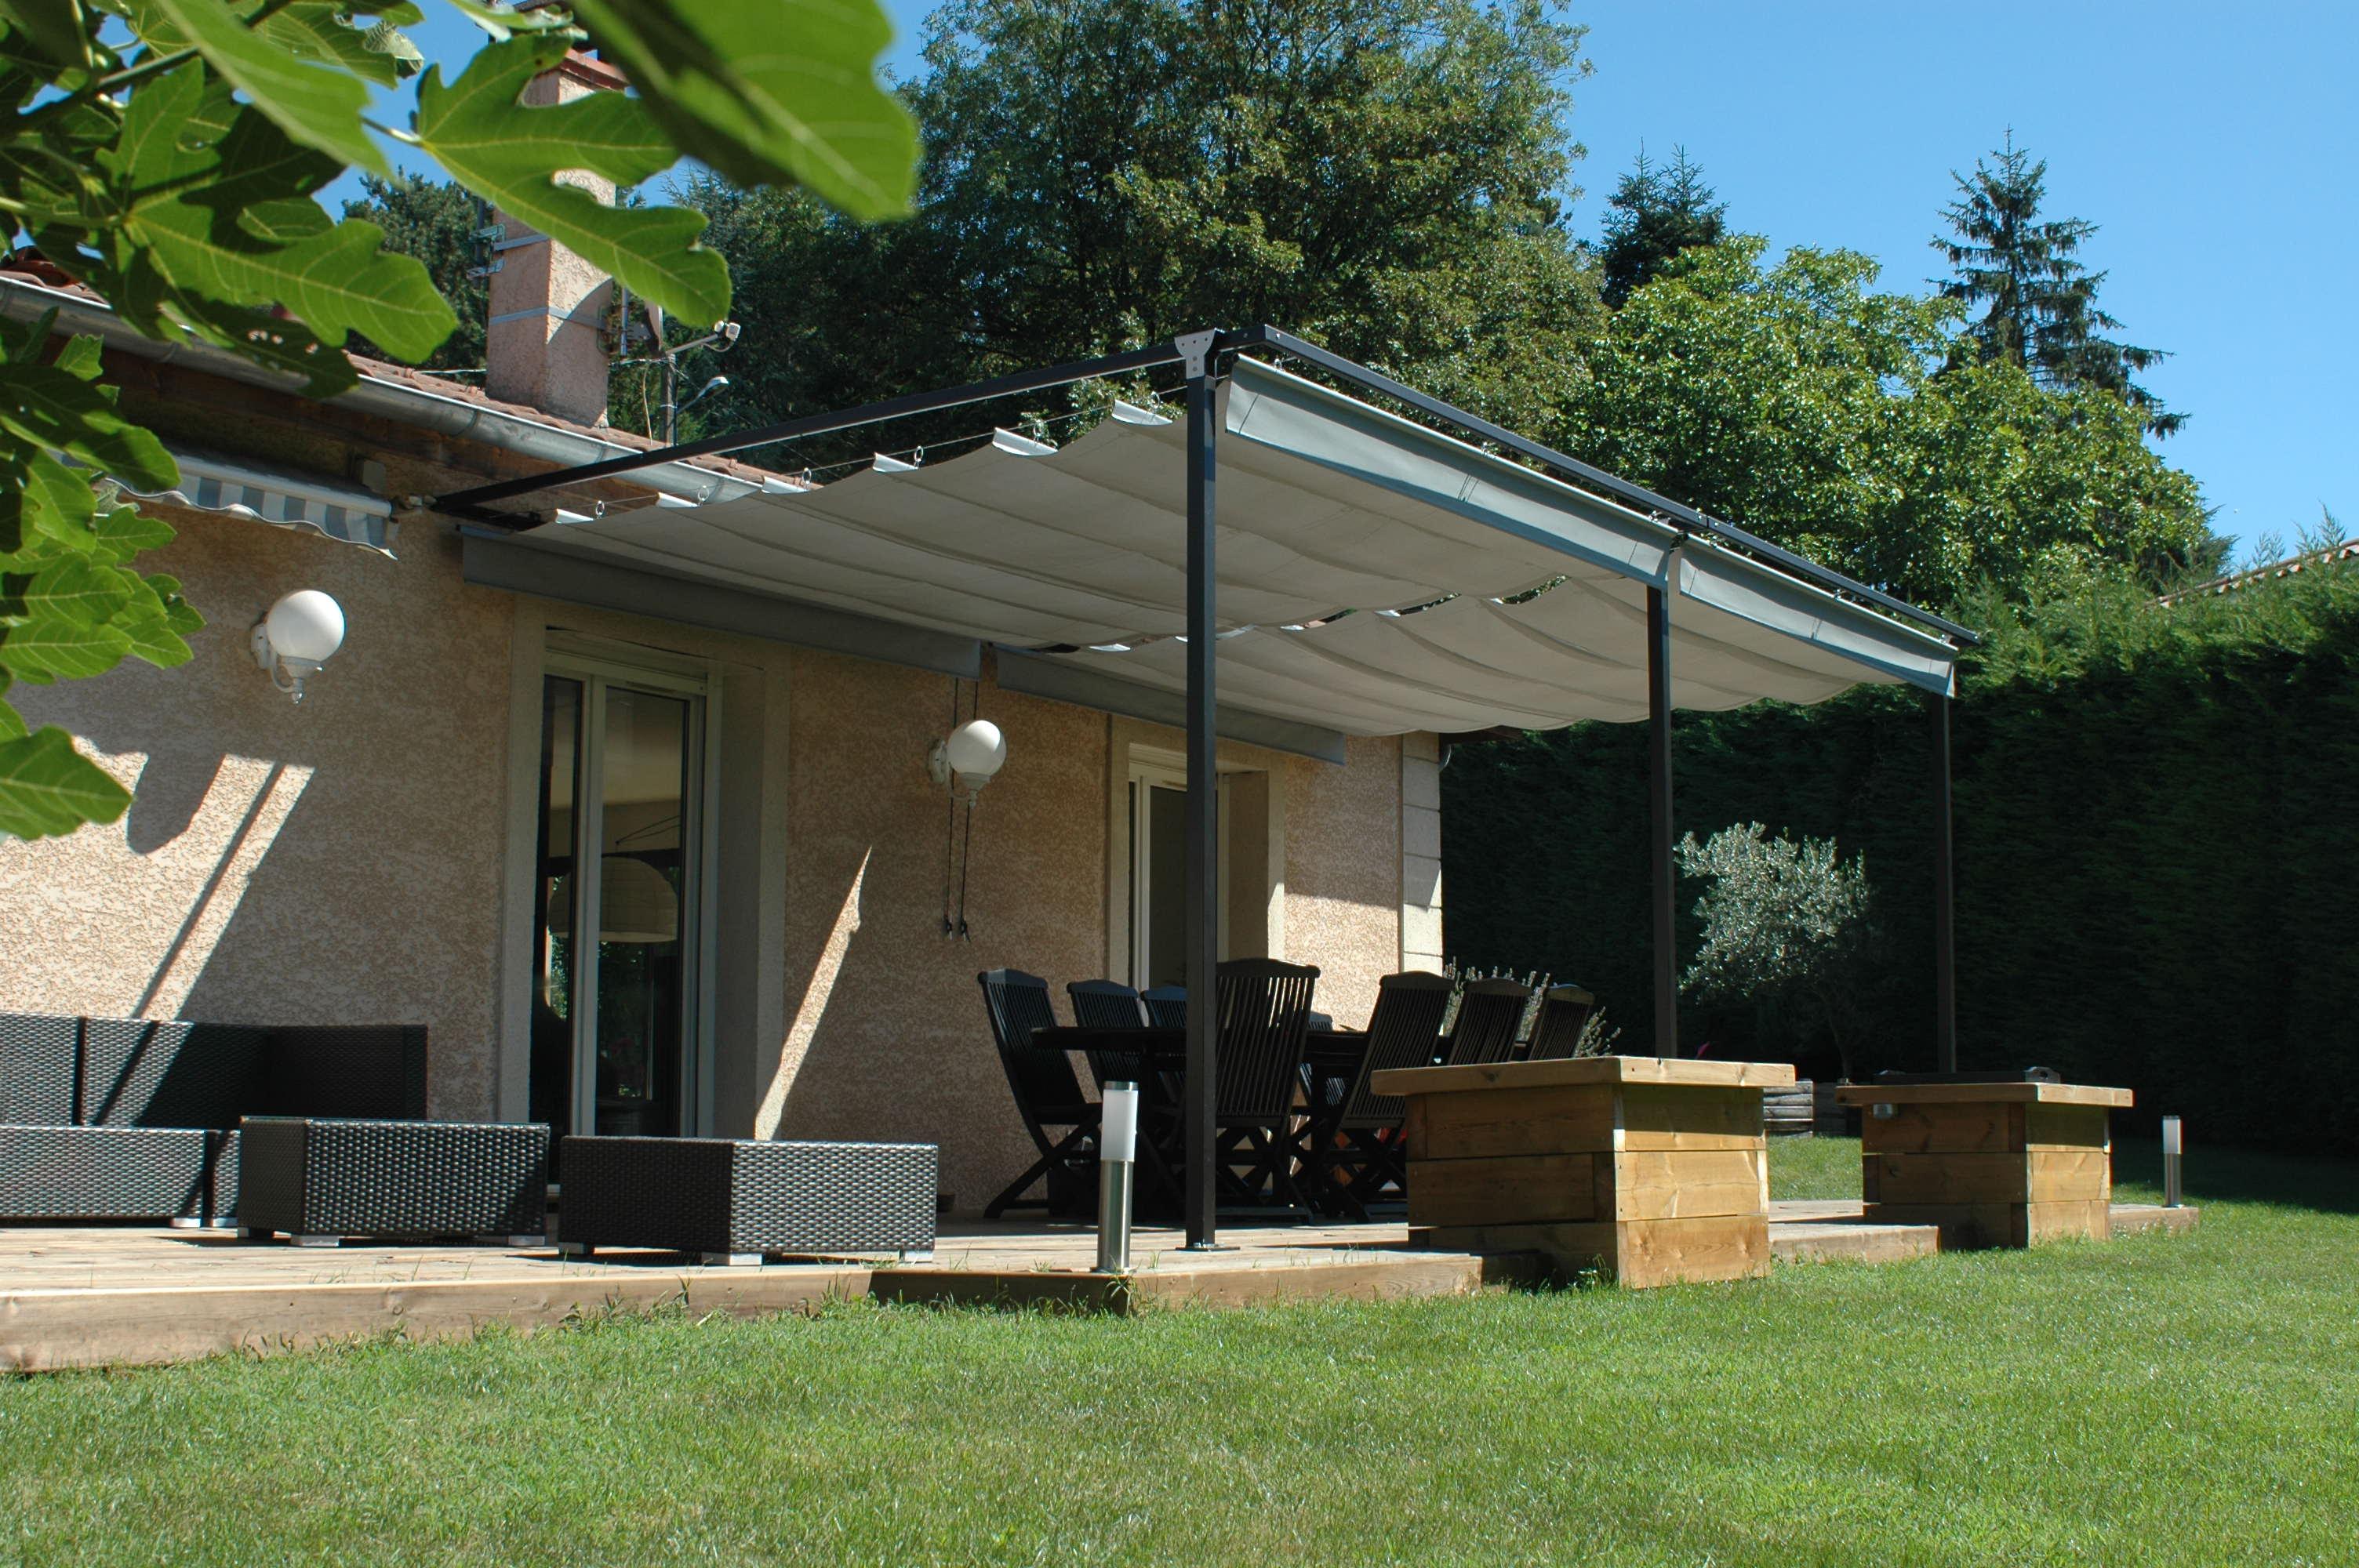 ombrage agr able de la pergola exonido 22m adoss e la fa ade plein sud exonido pergolas. Black Bedroom Furniture Sets. Home Design Ideas